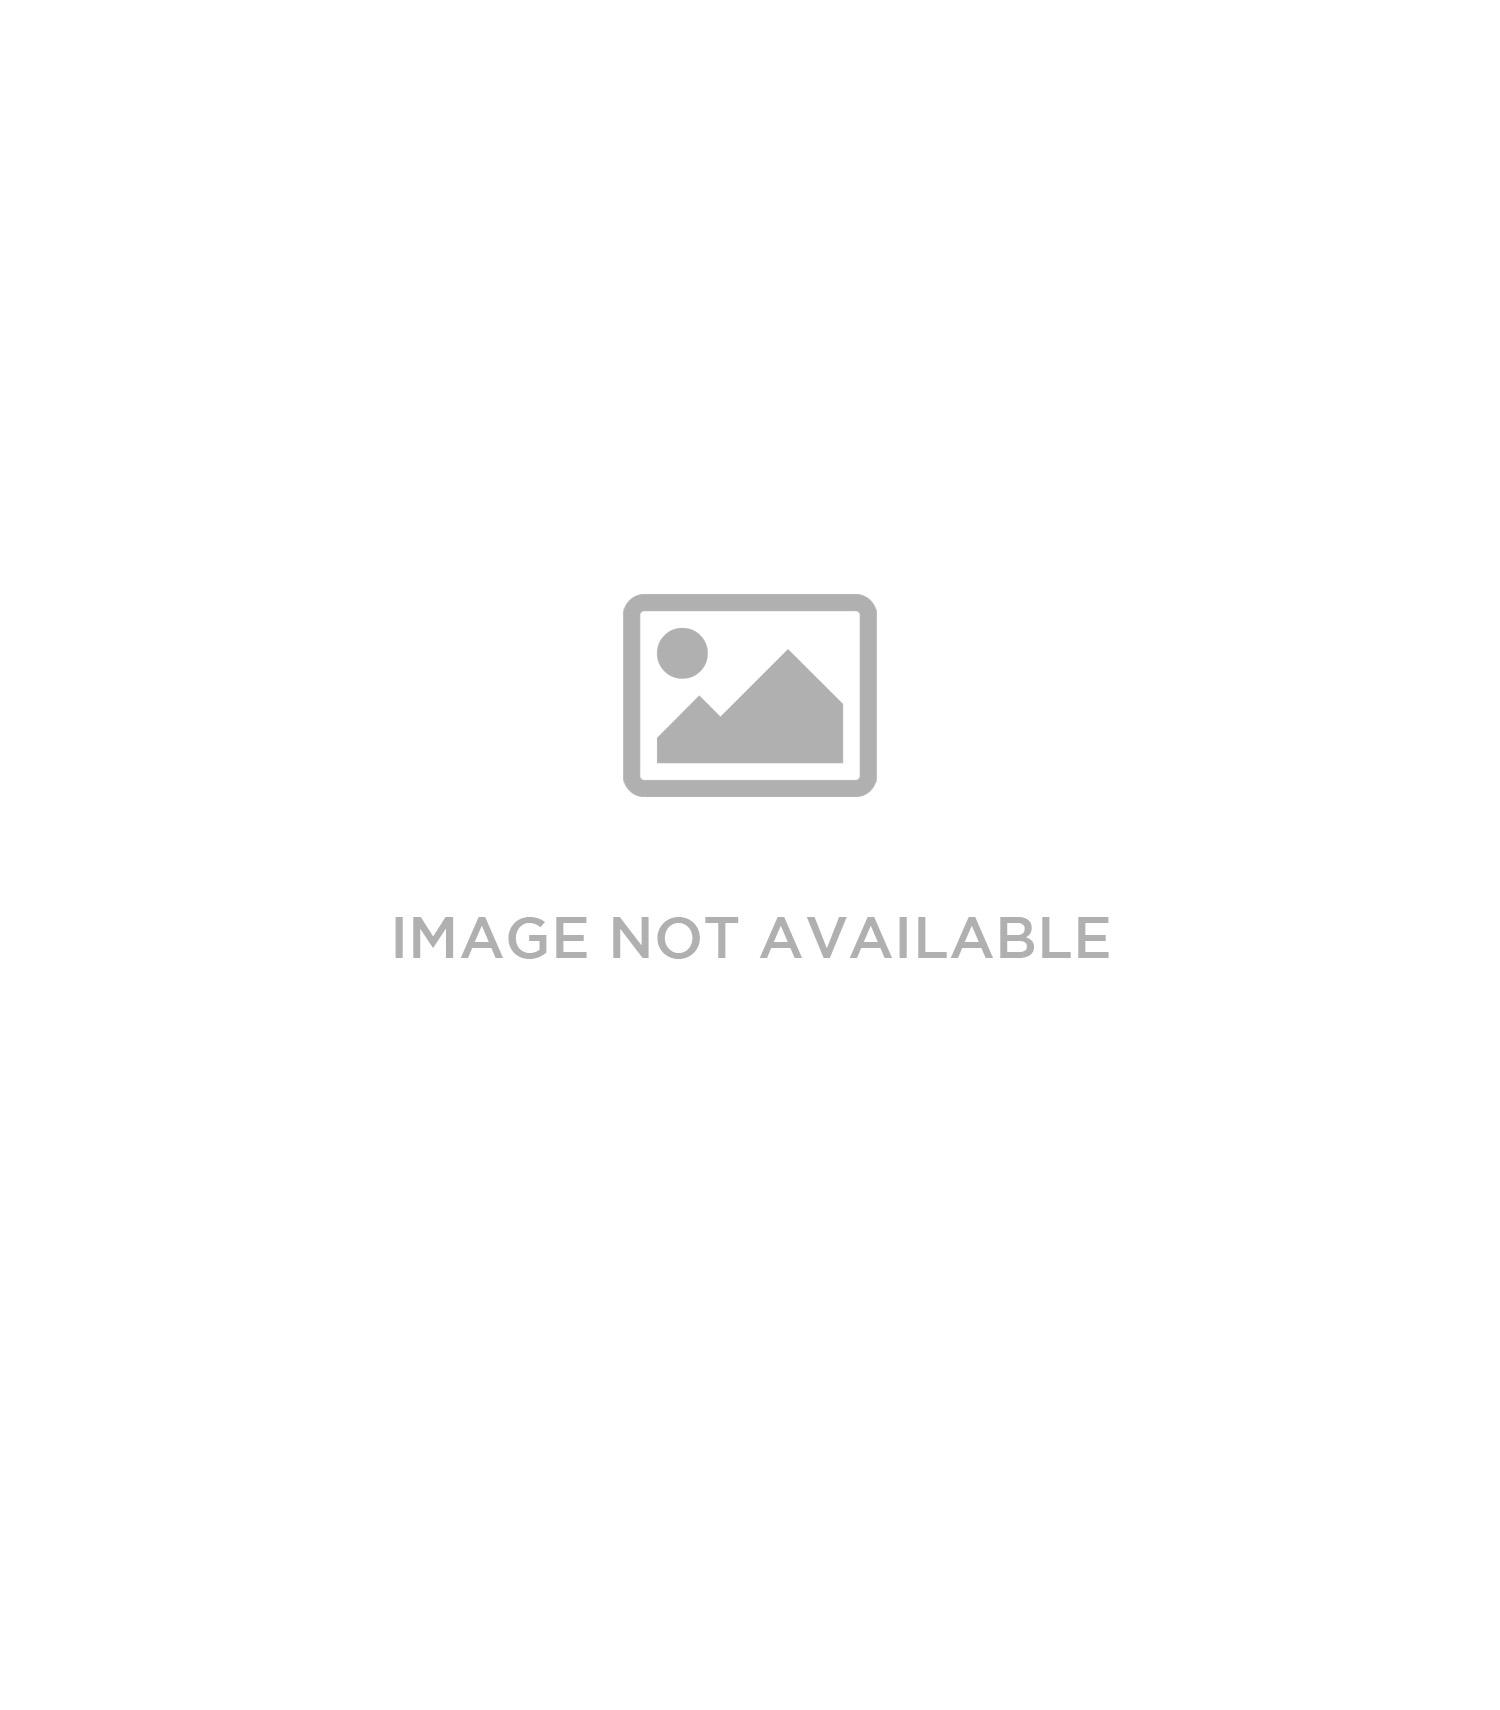 GILDAN®; PREMIUM COTTONTM RING SPUN FLEECE HOODED SWEATSHIRT. 92500